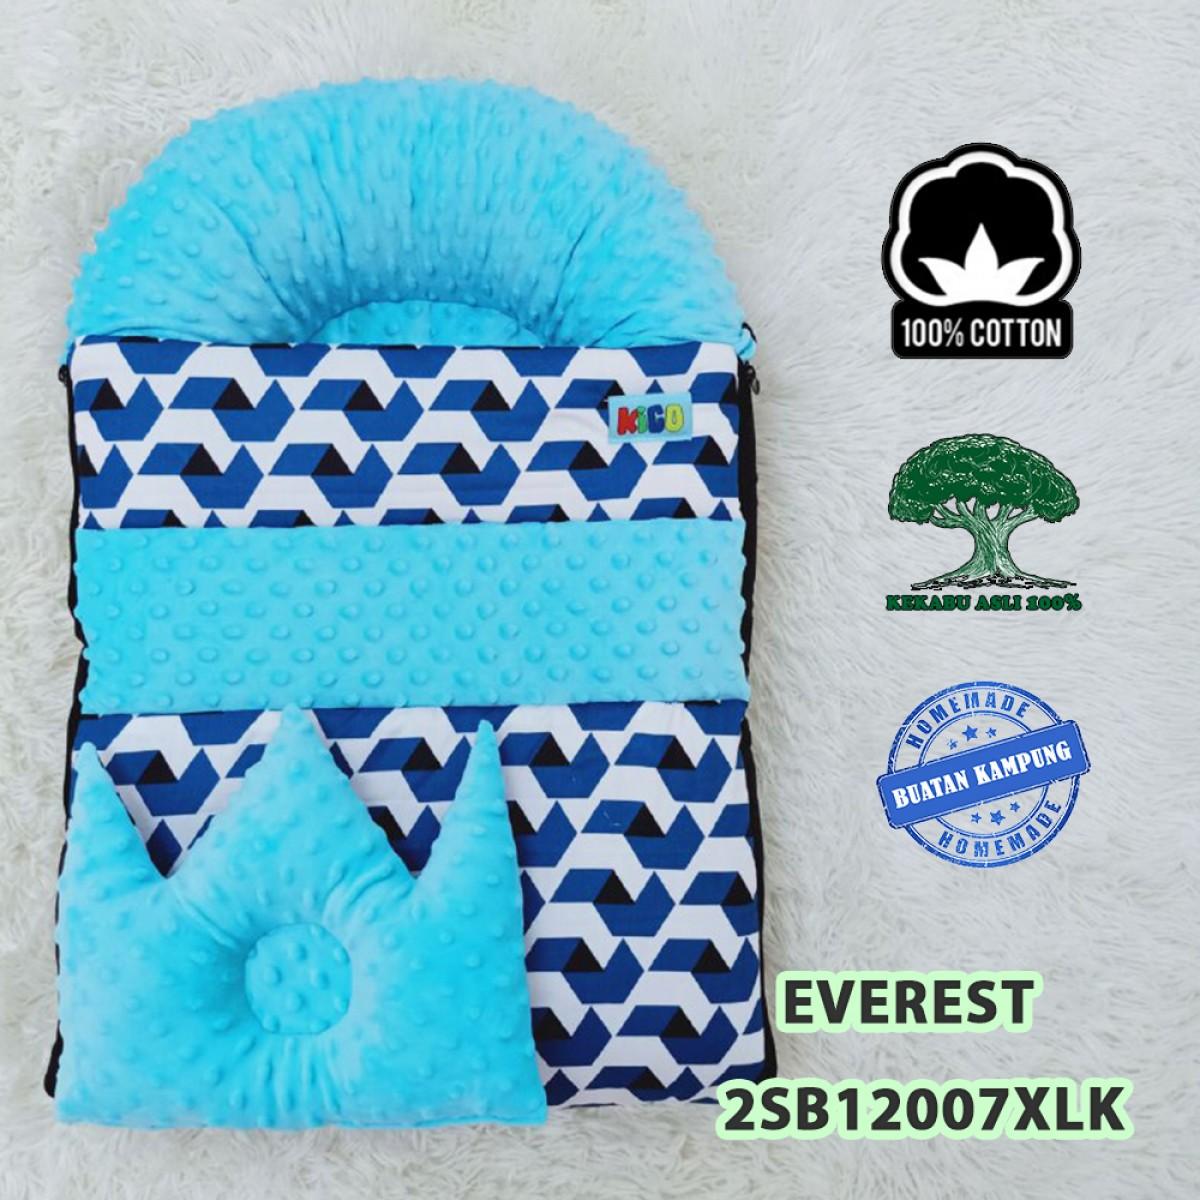 Everest - Kico Baby Center